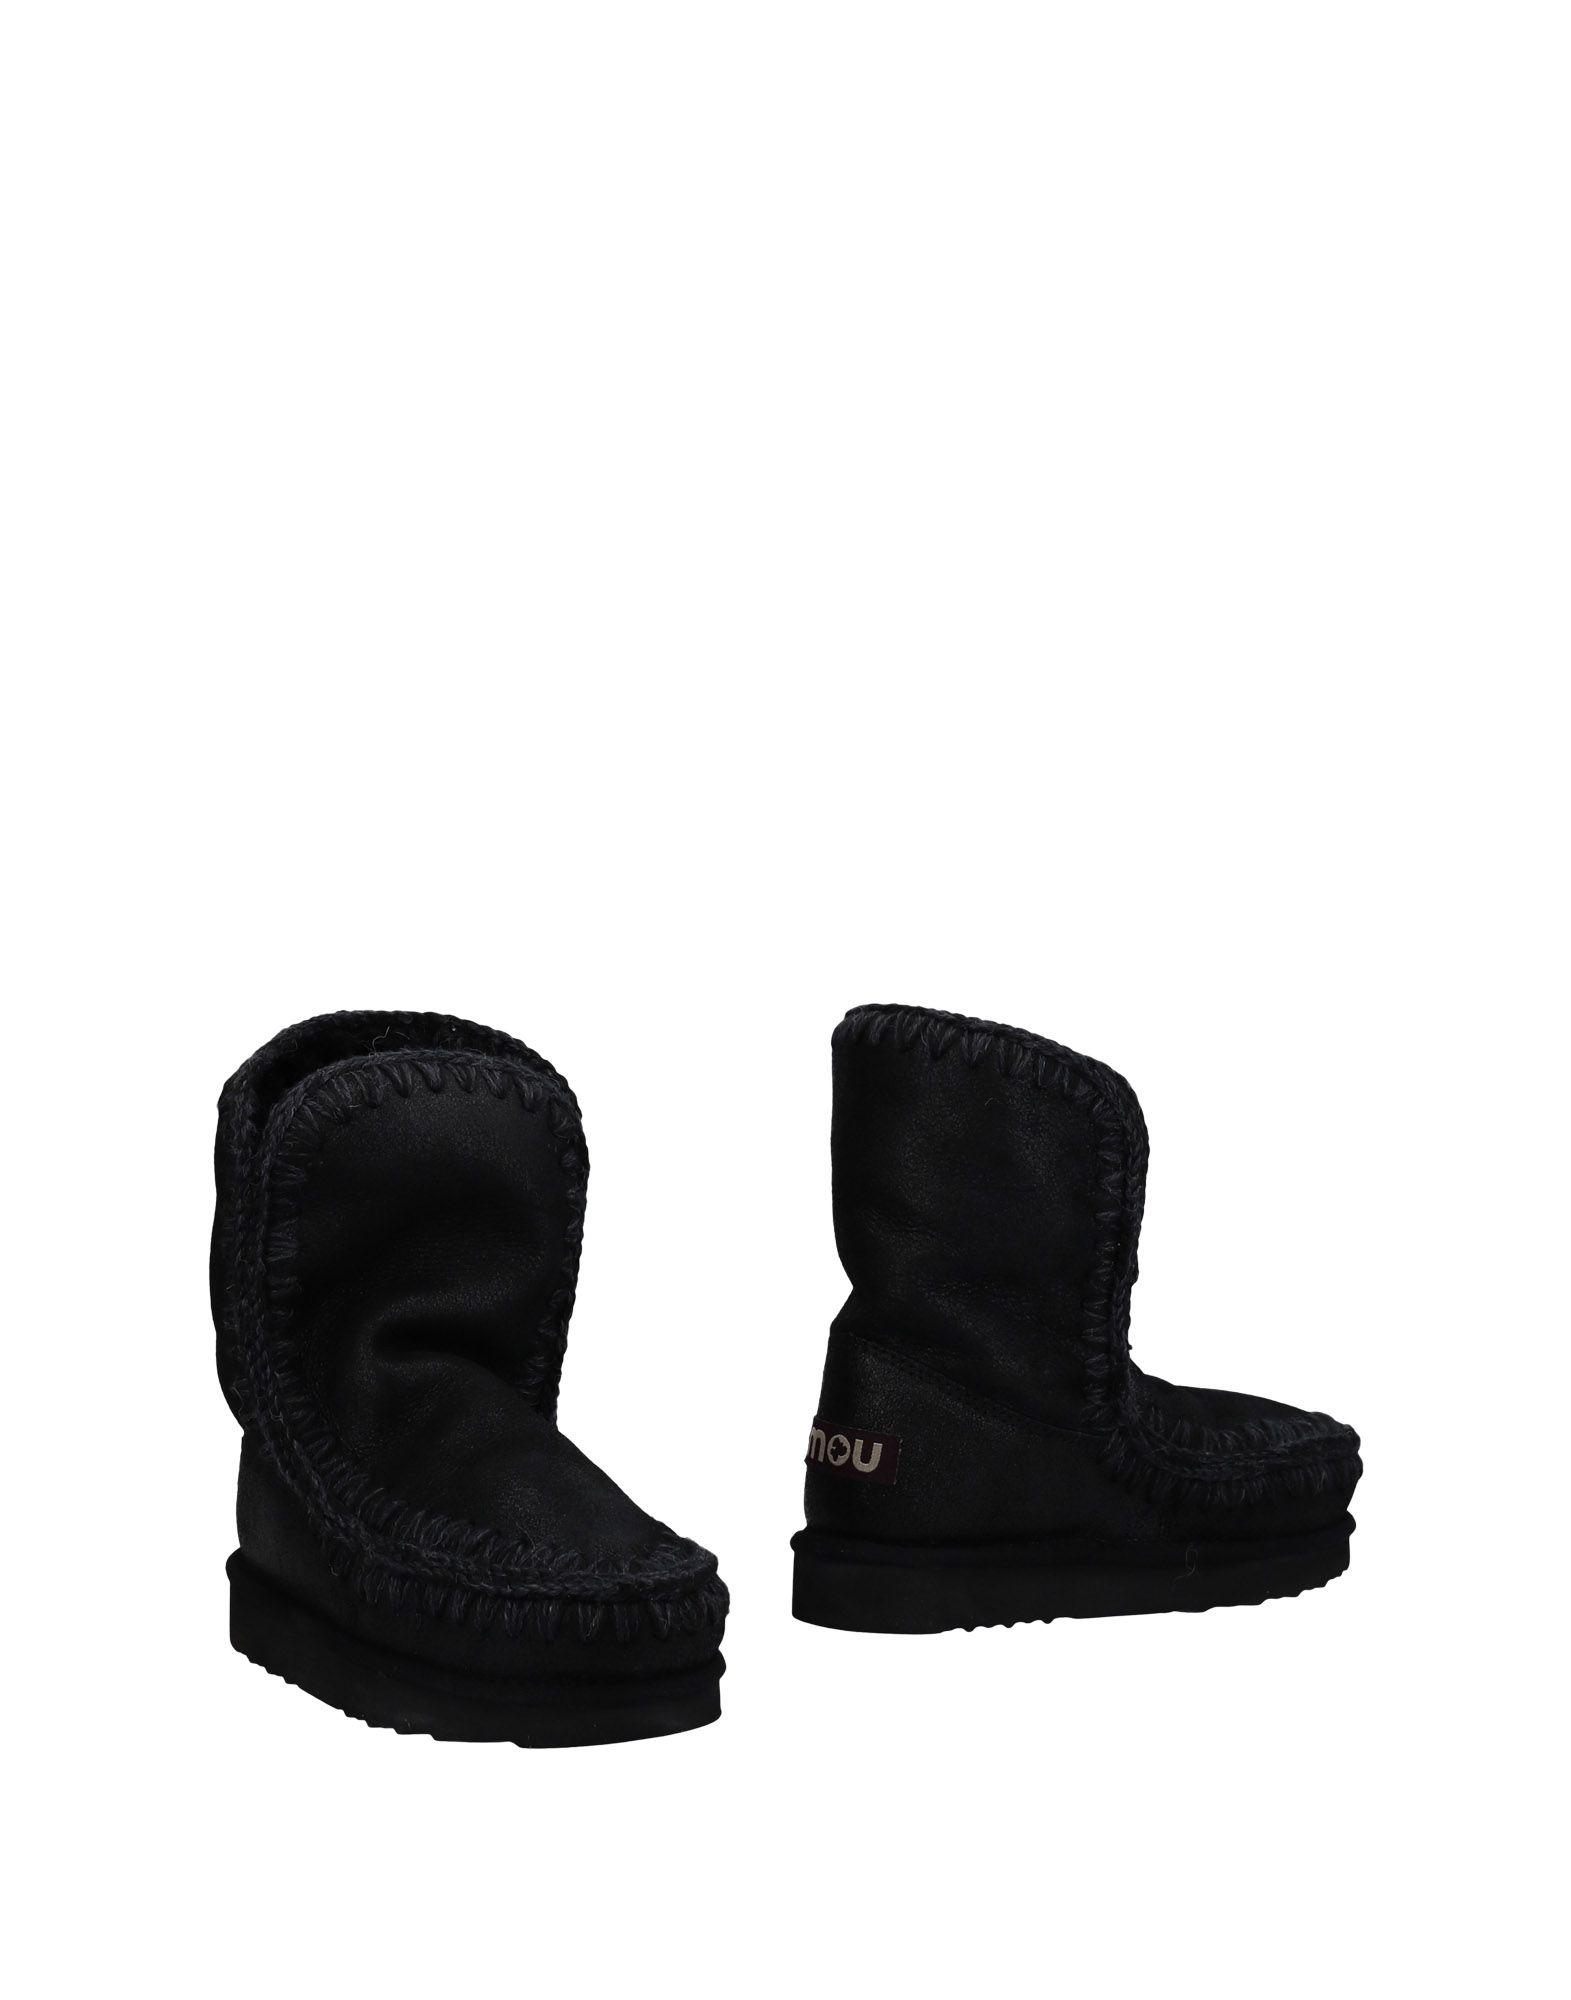 Stilvolle Damen billige Schuhe Mou Stiefelette Damen Stilvolle  11484688VB 3a8019